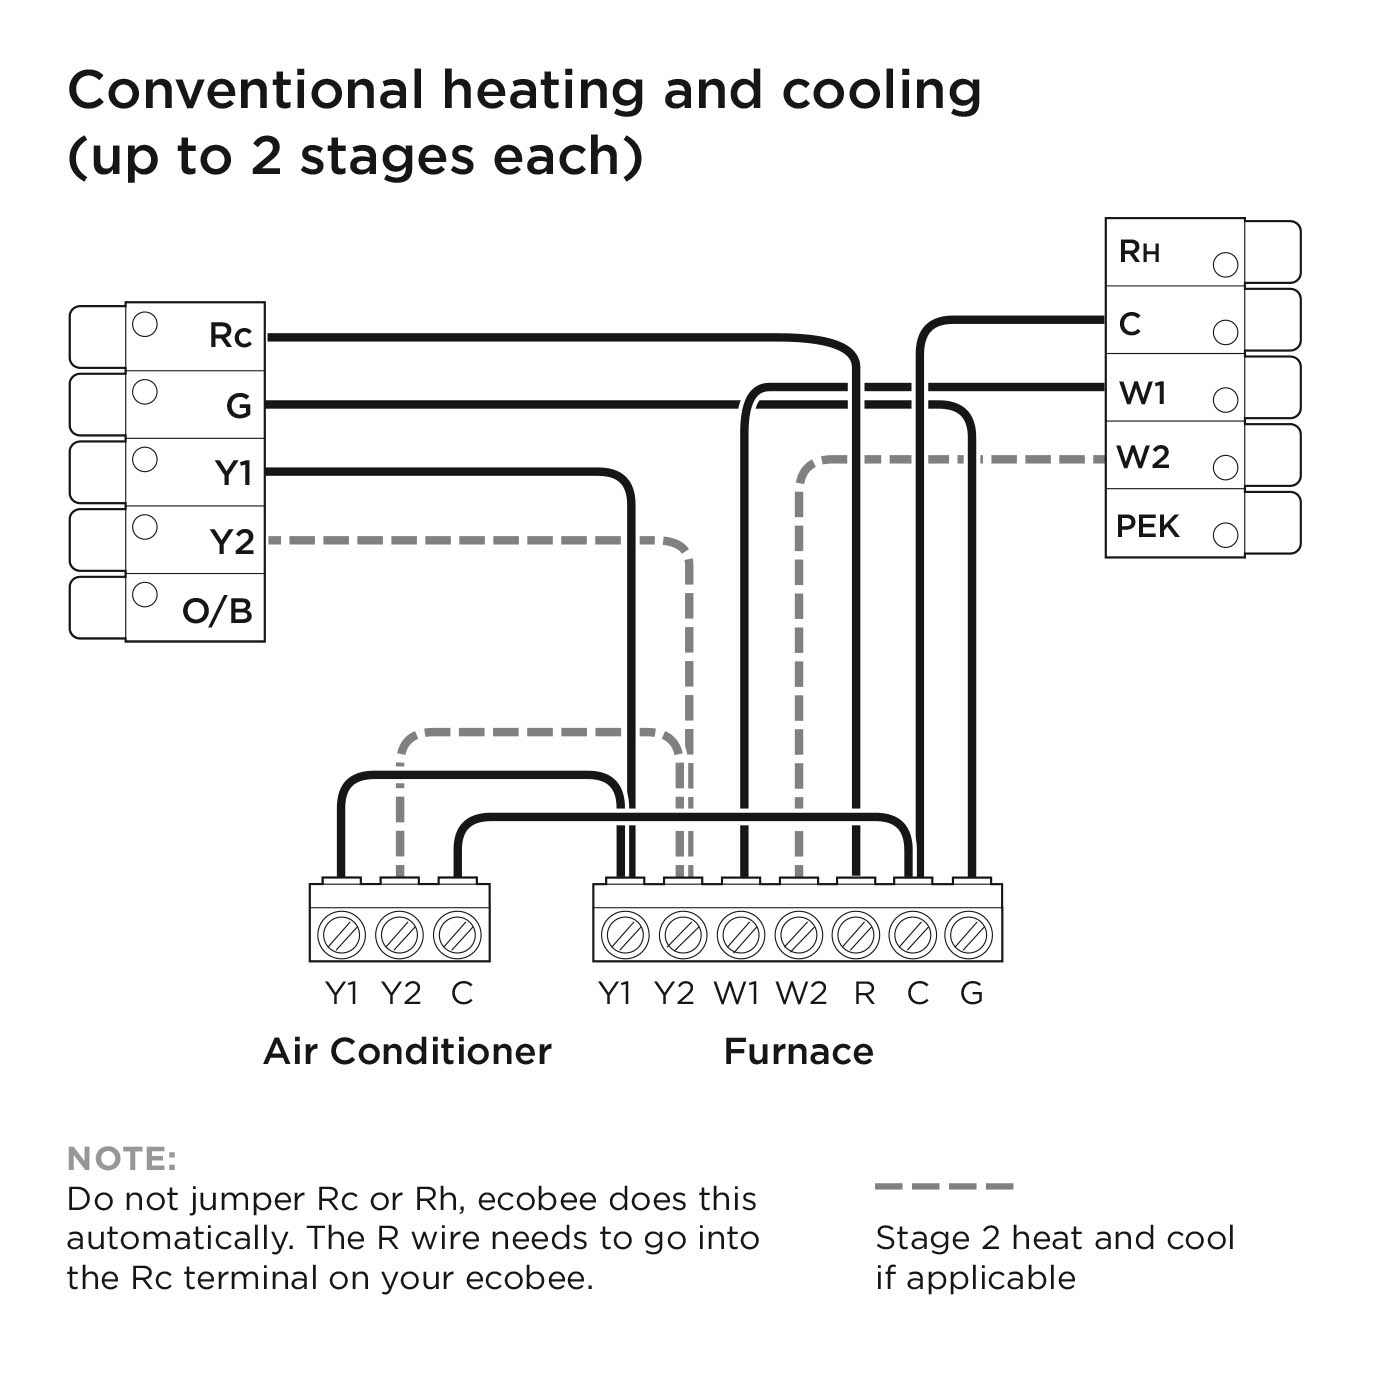 Ecobee3 Lite Wiring Diagrams – Ecobee Support - Ecobee Wiring Diagram